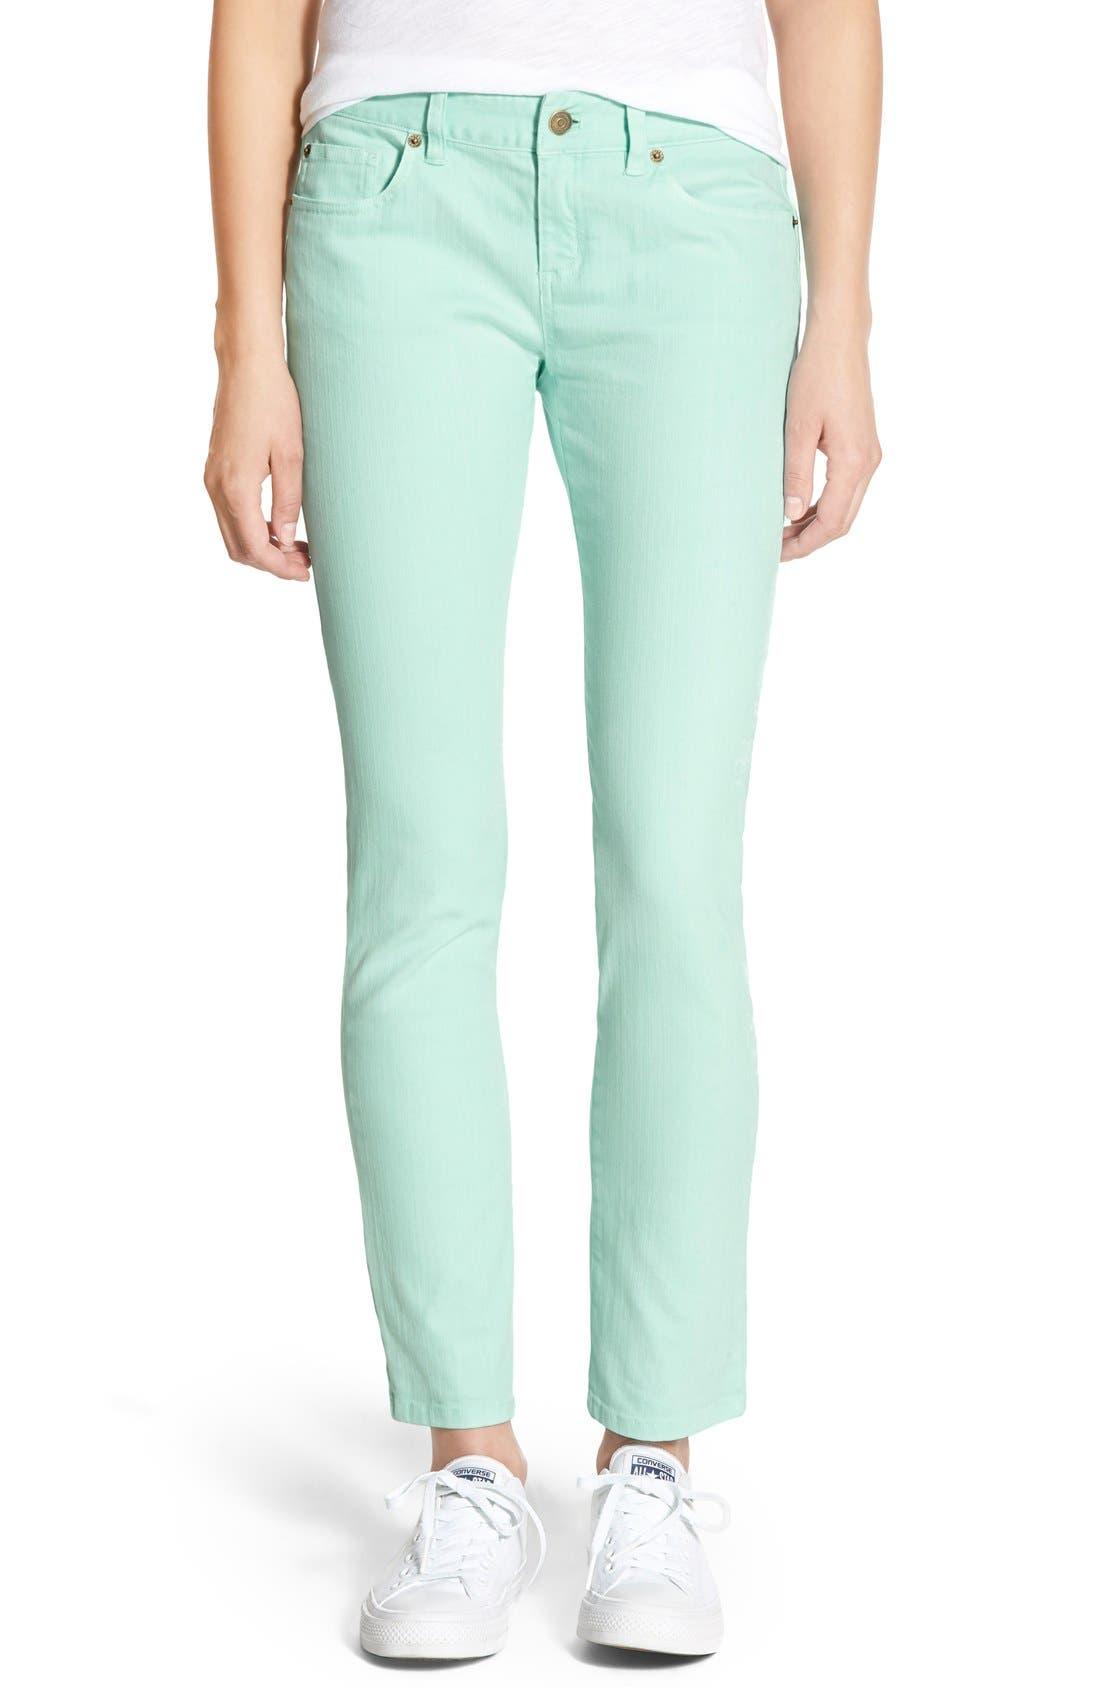 Alternate Image 1 Selected - Vineyard Vines Colored Skinny Jeans